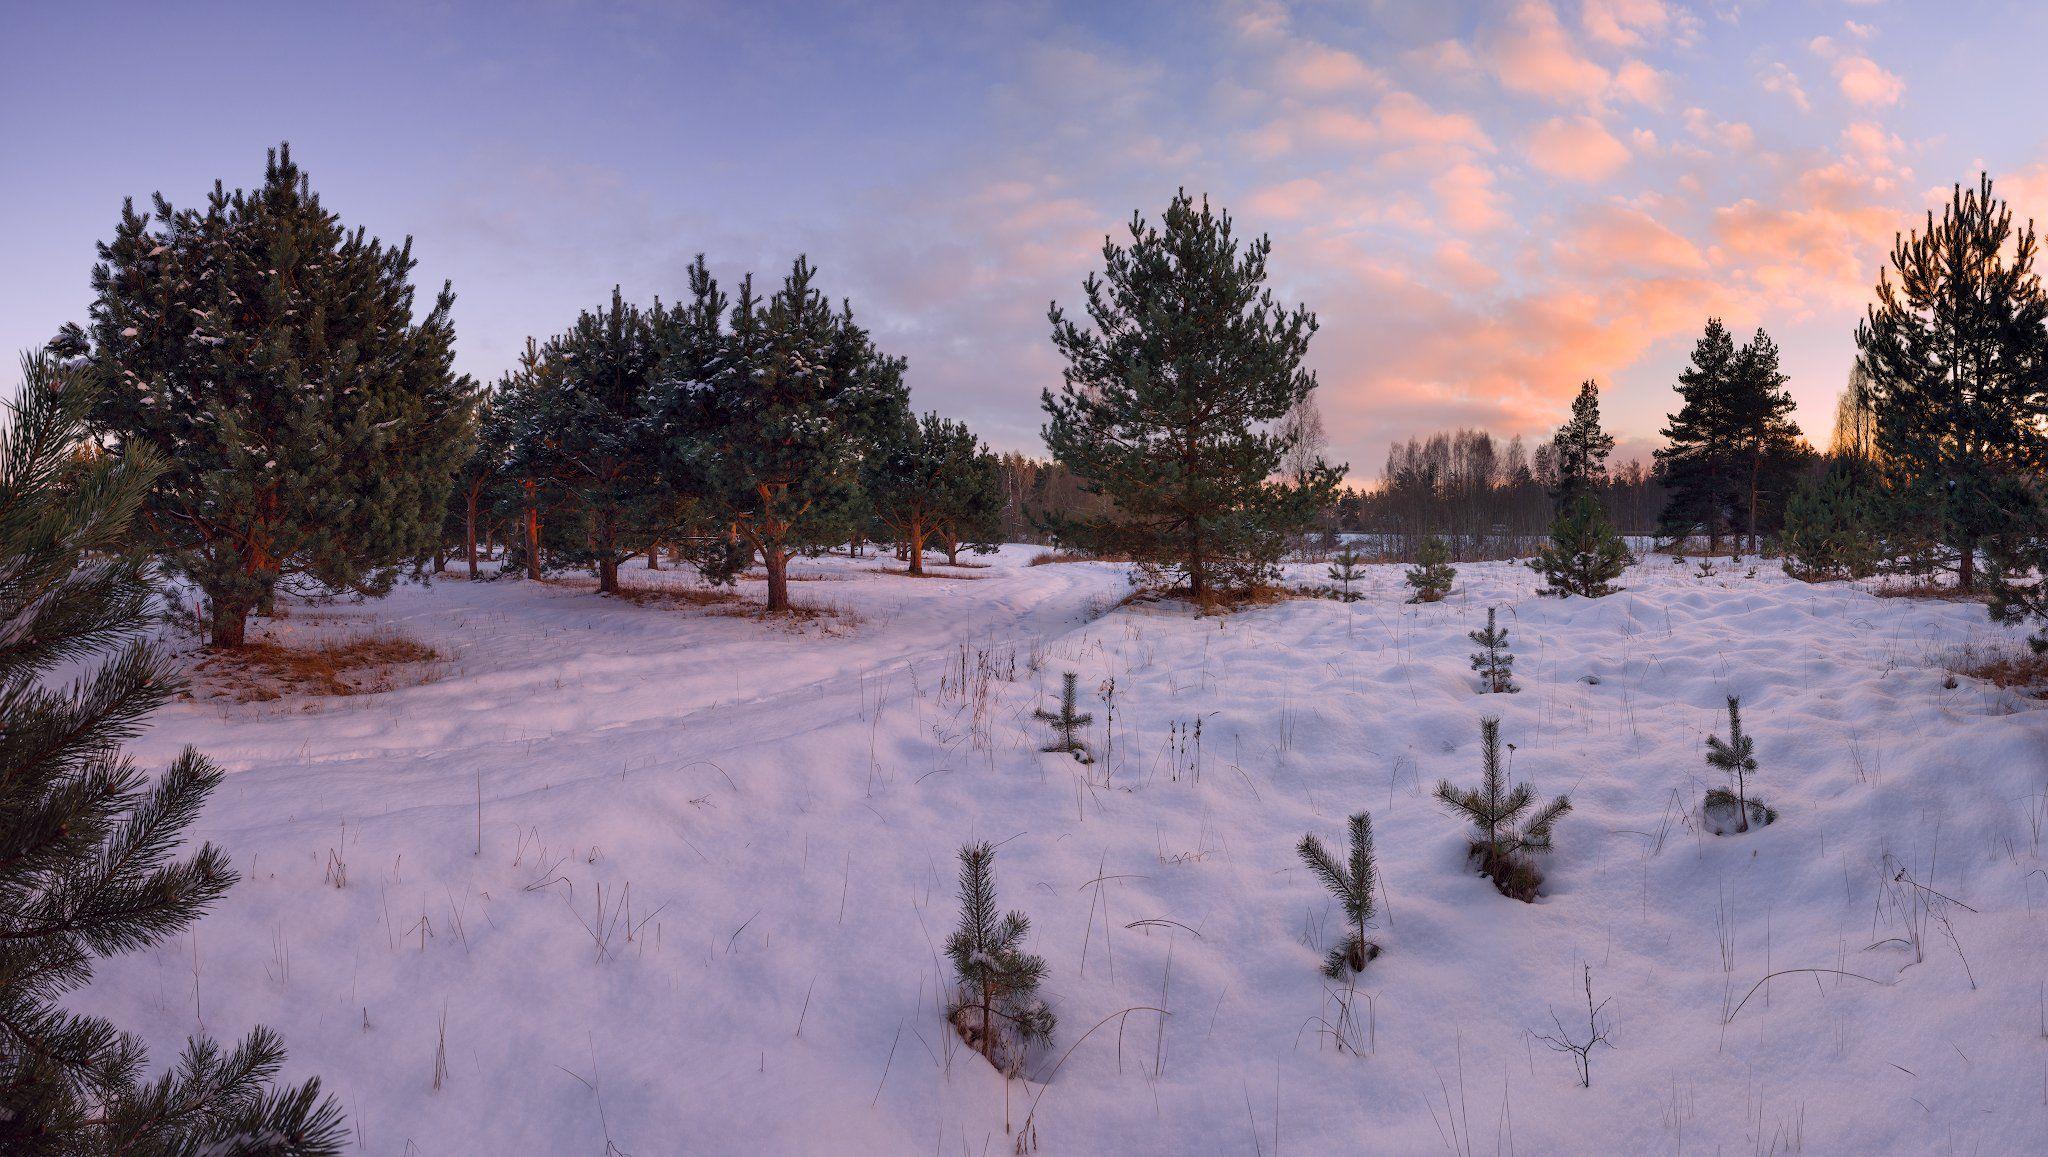 панорама, закат, зима, пейзаж, латвия, Алексей Мельситов